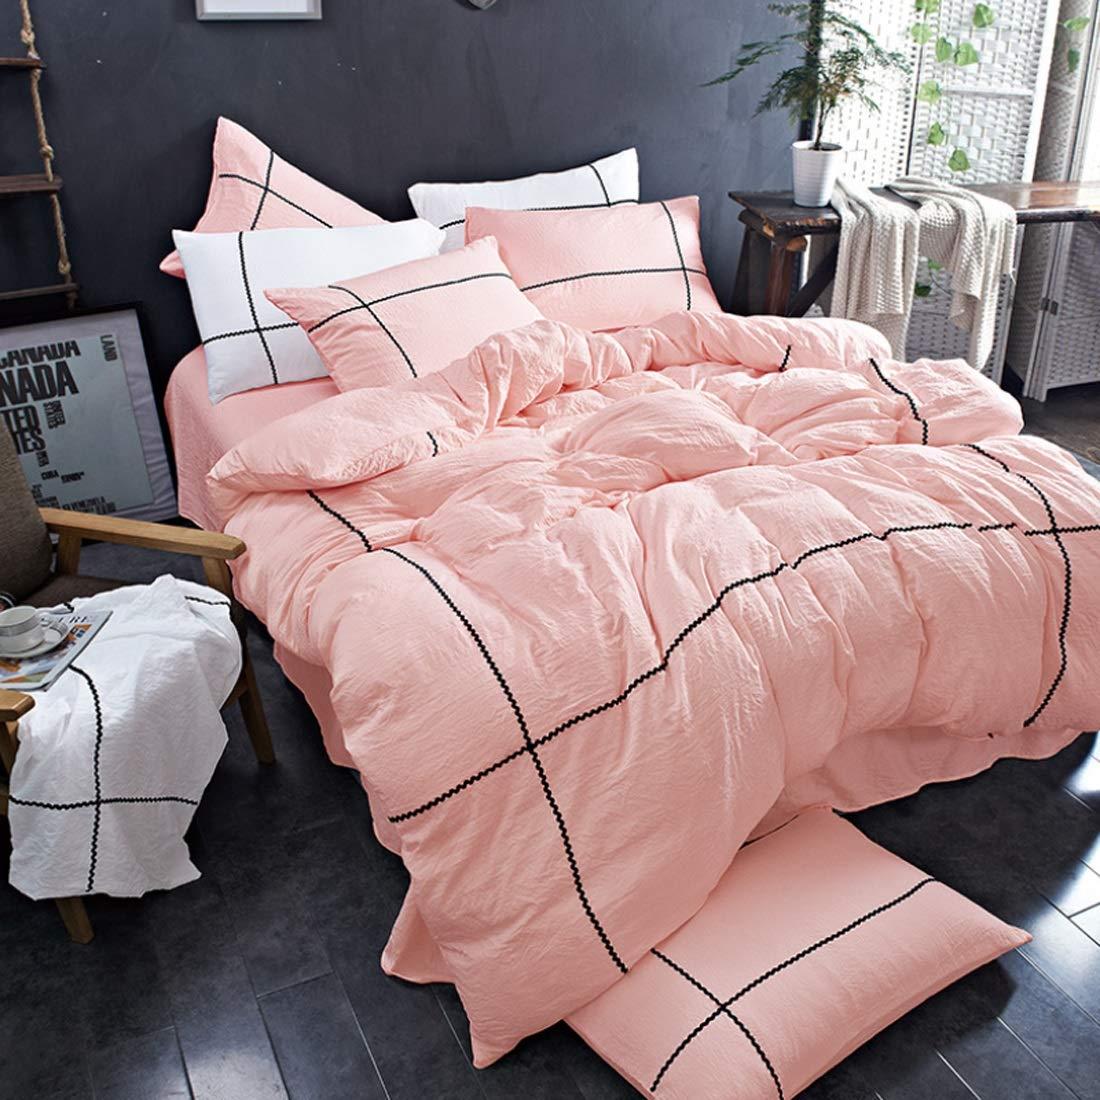 Aikemi kasur 寝具カバーセット 4セット ベッド寝具セット 掛け布団カバー 高級綿 ベッドリネン枕カバー インテリアに適し 抗菌 防臭 (色 : オレンジ, サイズ : 220*240CM) B07SX1MBMJ